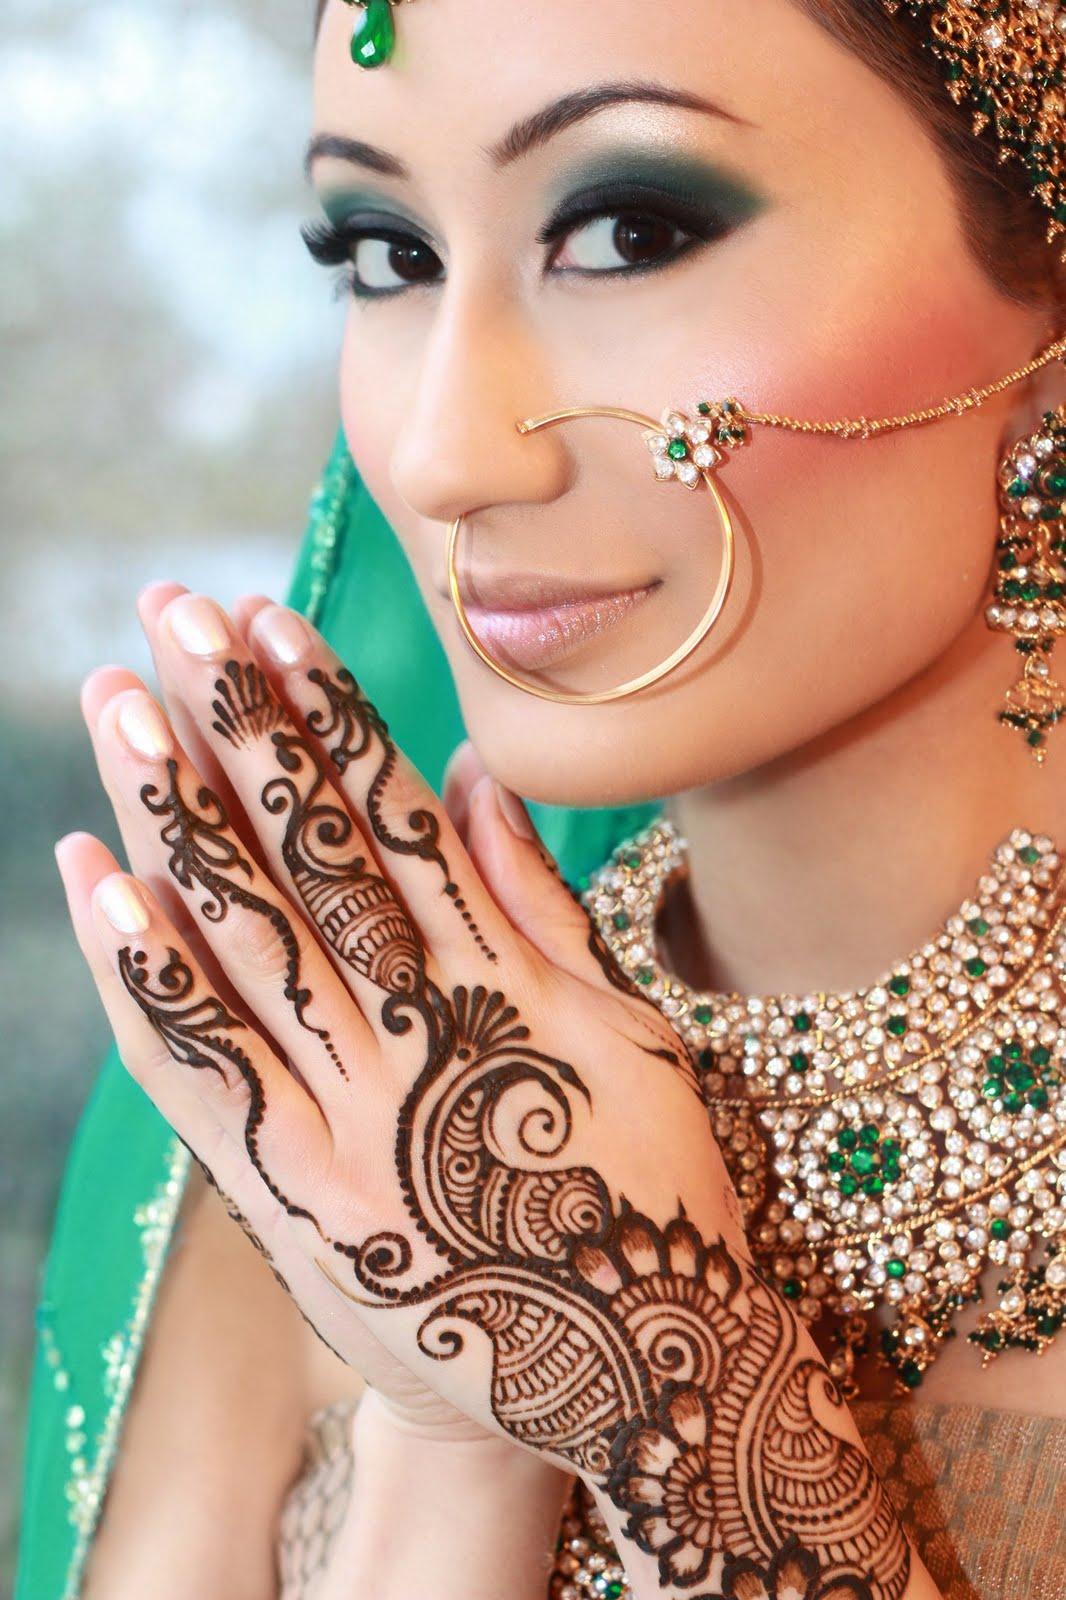 New Wedding Makeup : New Bridal Makeup in India Latest Indian makeup trends ...